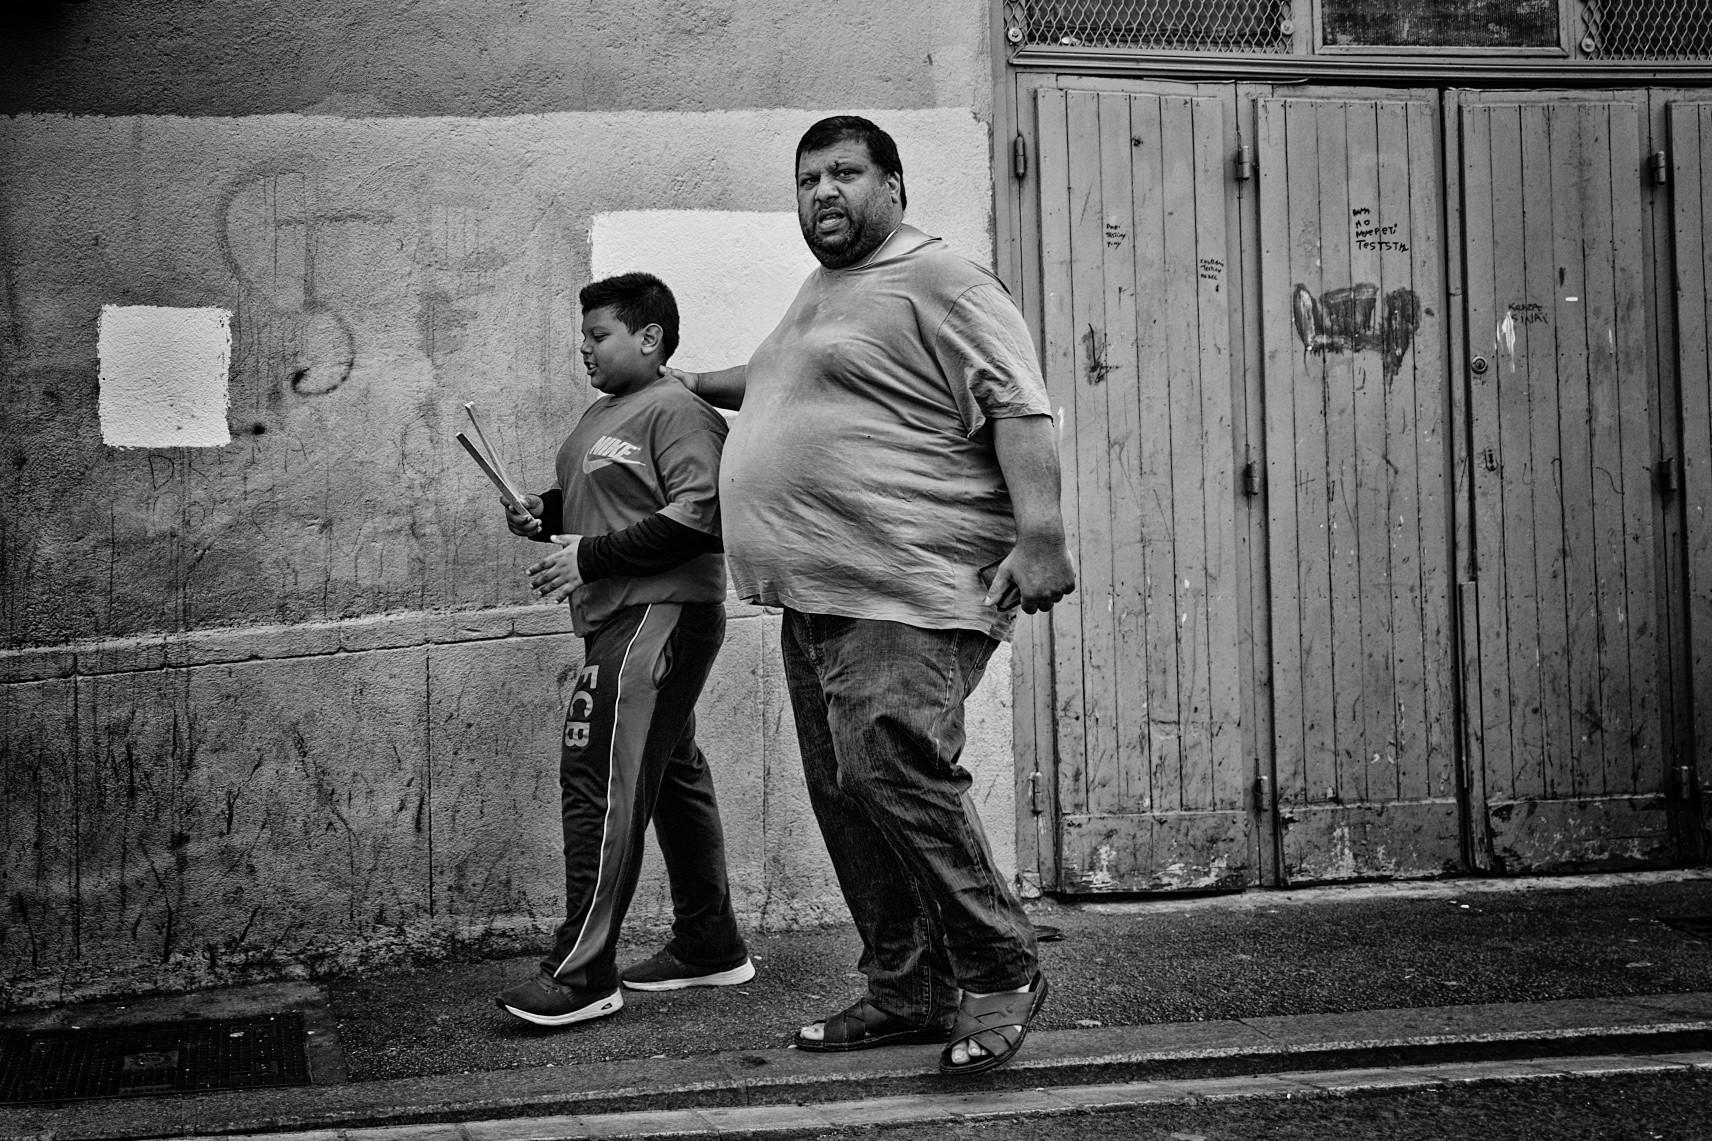 Perpignan - The Gypsies of Saint-Jaques